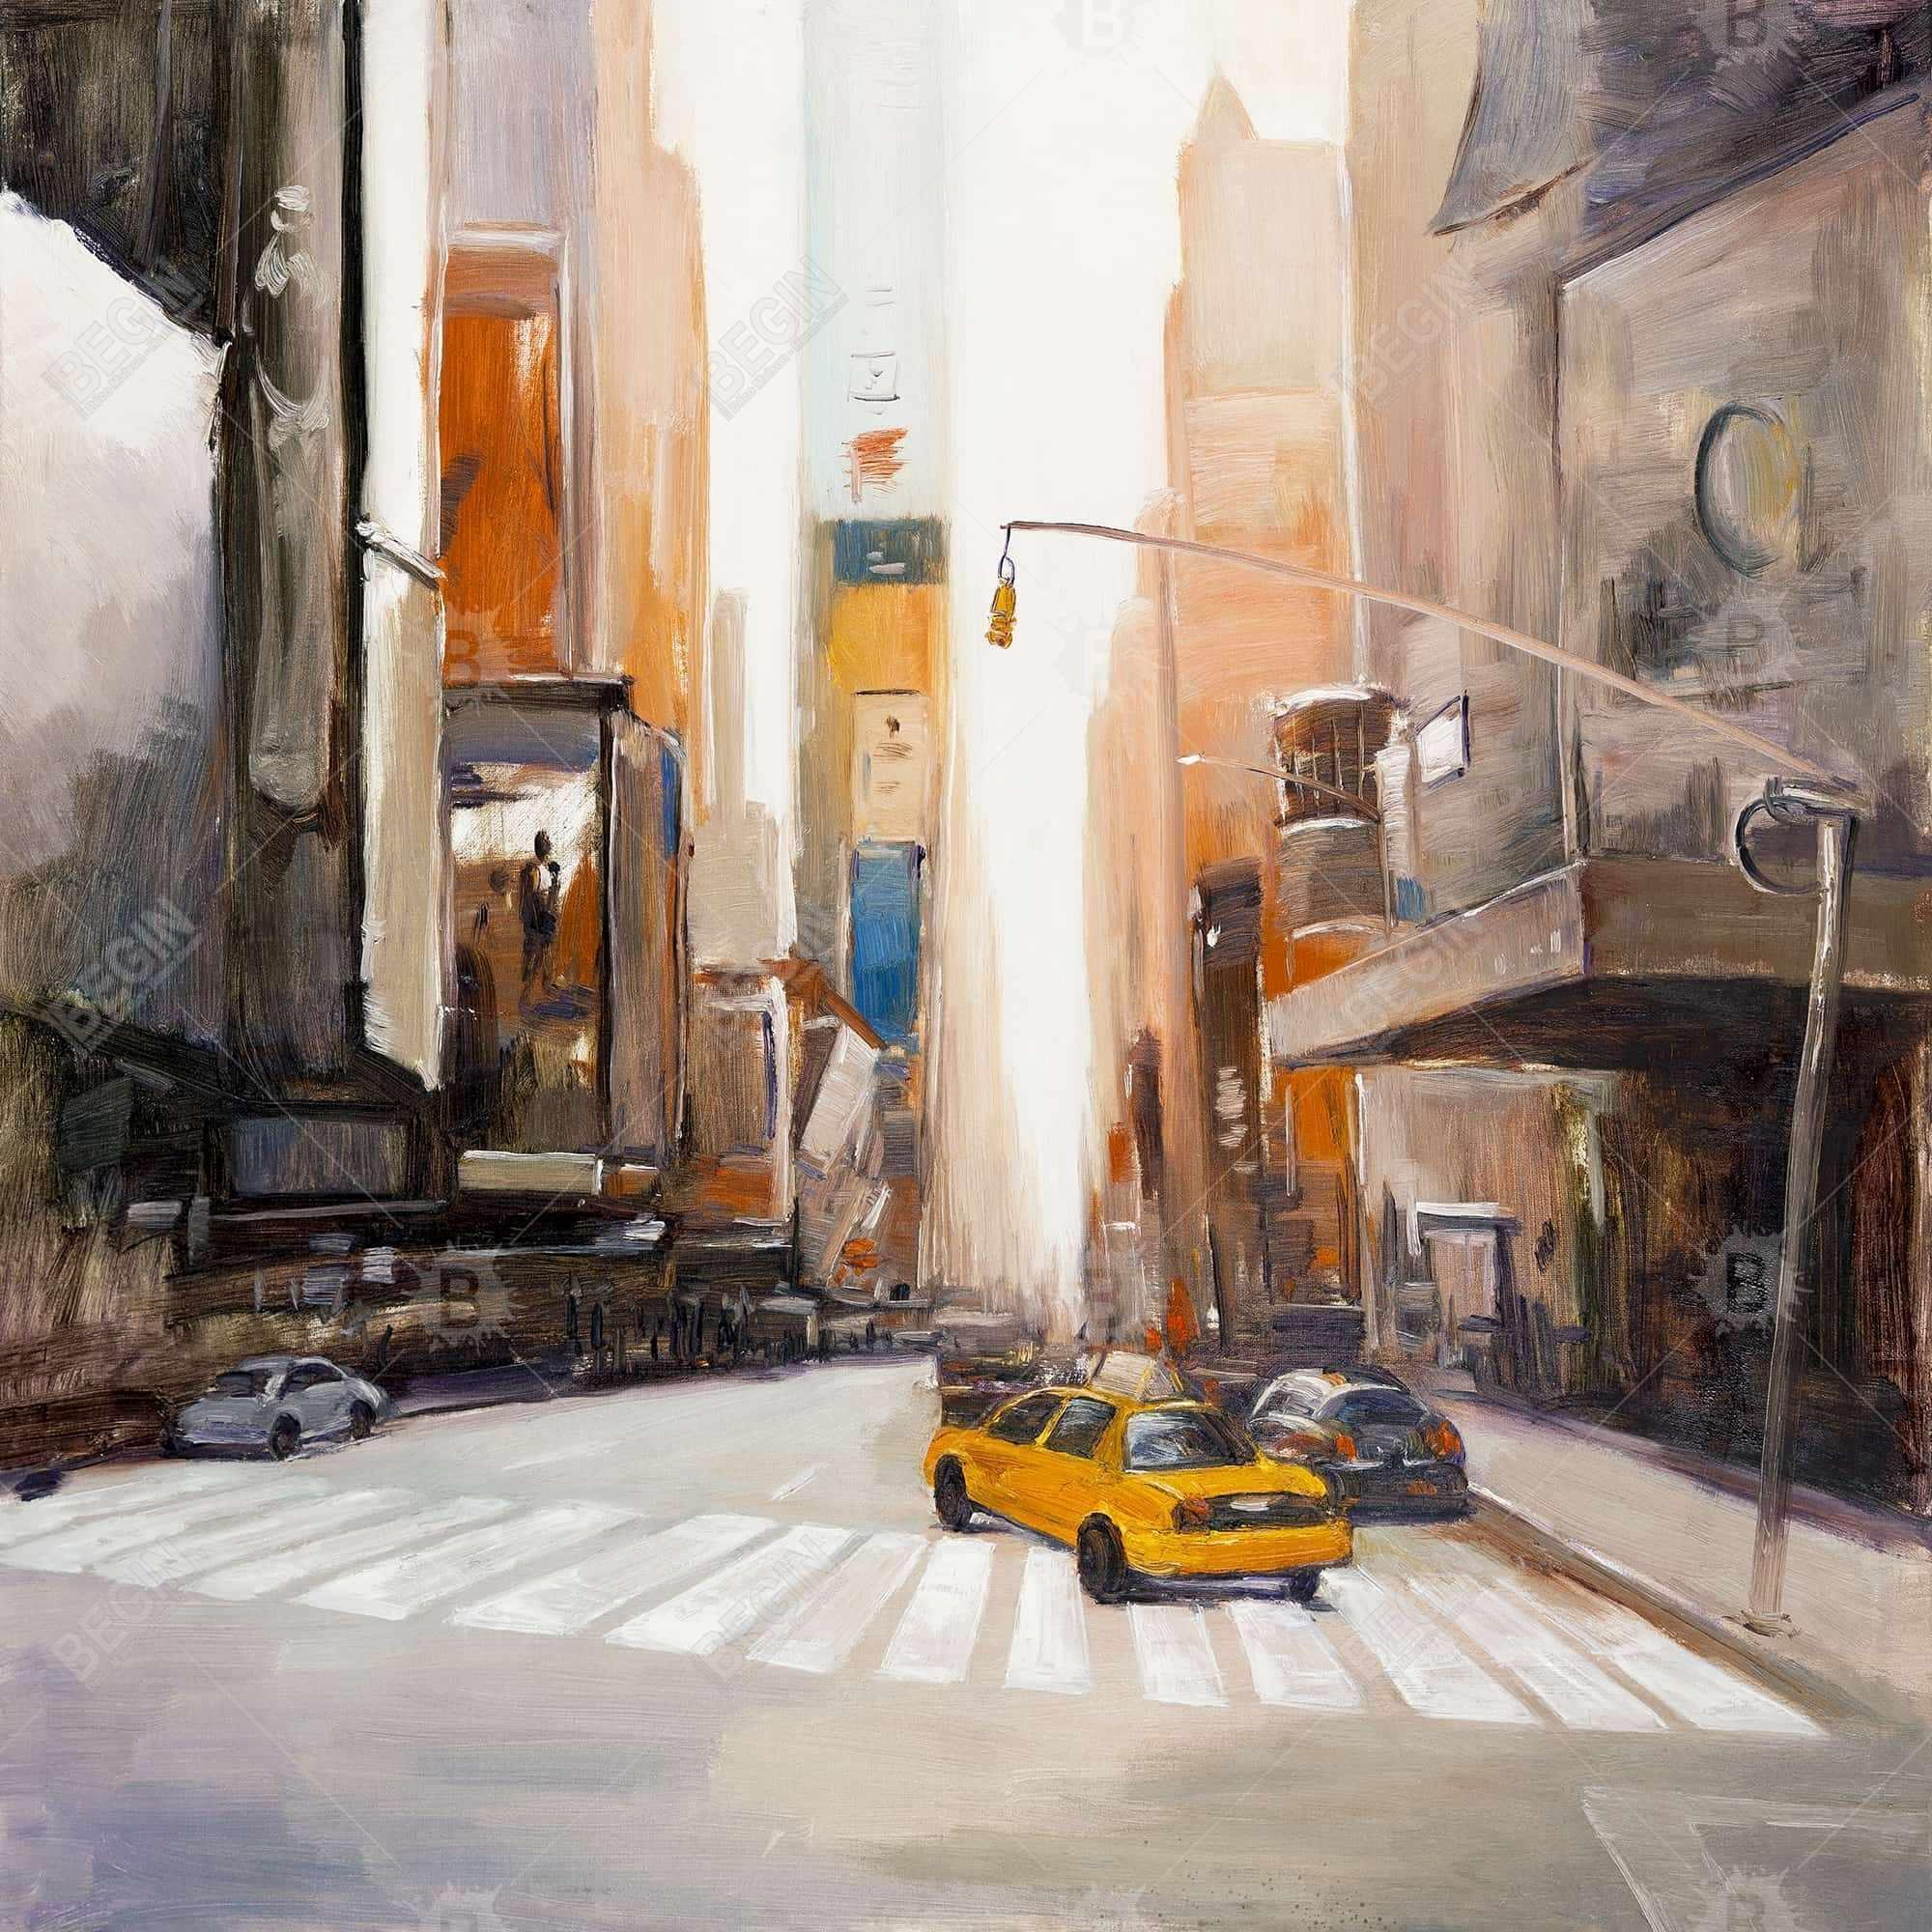 New-york city center